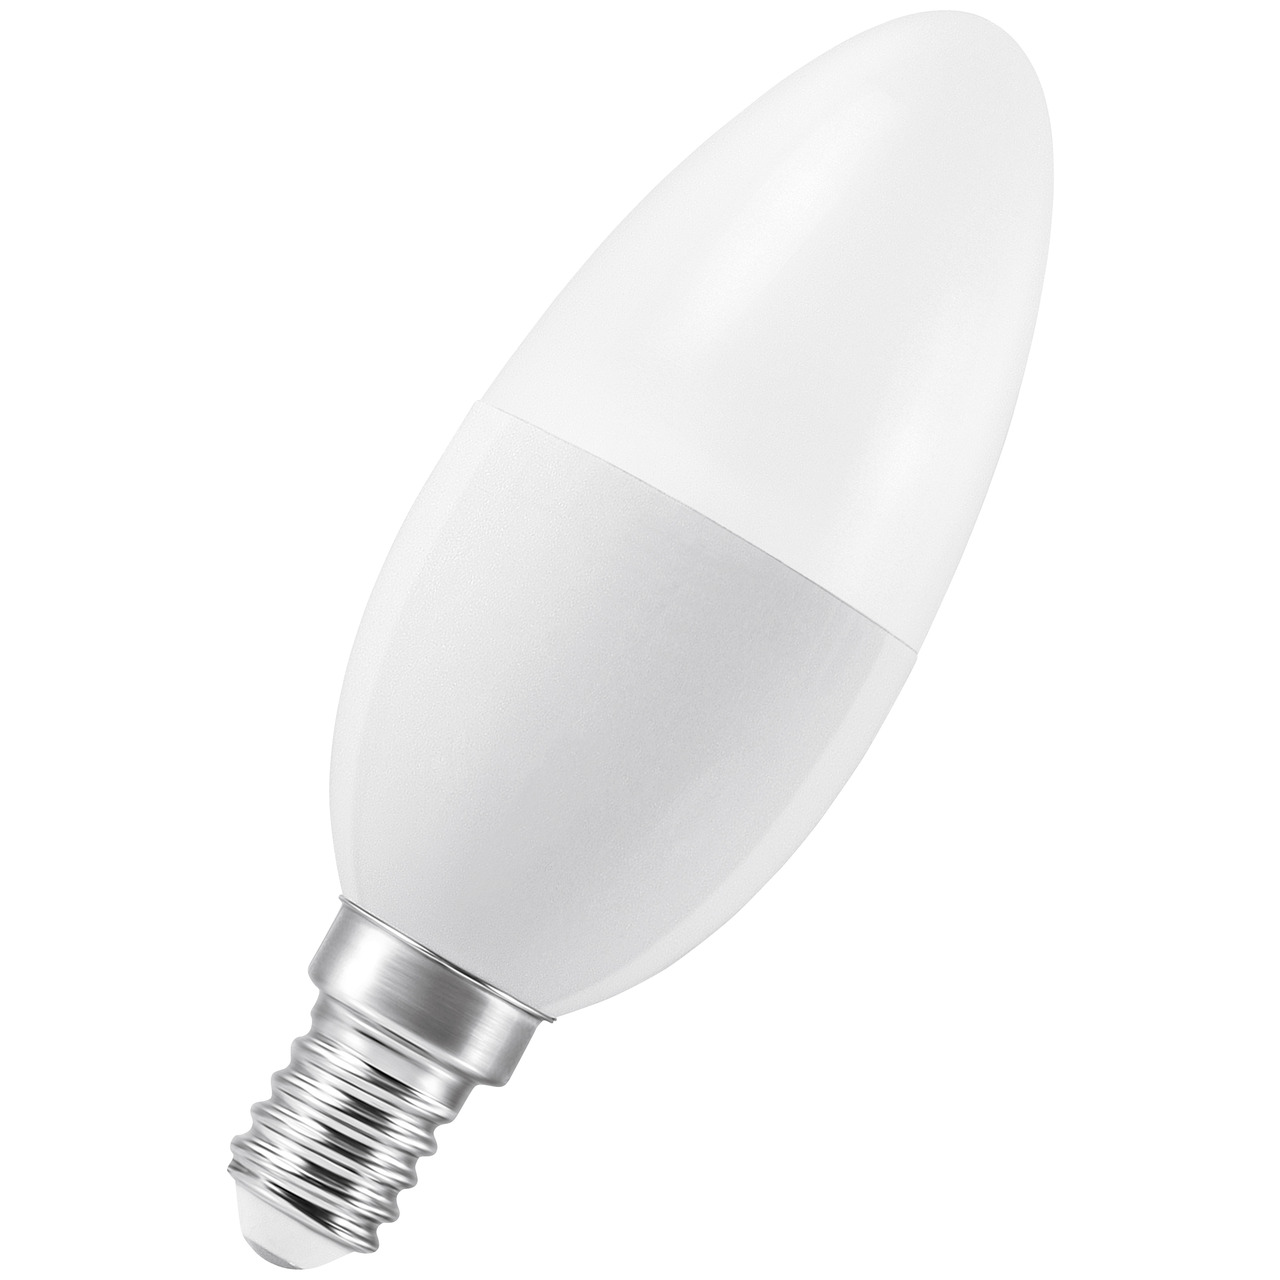 Ledvance SMART+ 6-W-LED-Kerzenlampe E14- dimmbar- ZigBee- Sprachsteuerung mund-246 glich